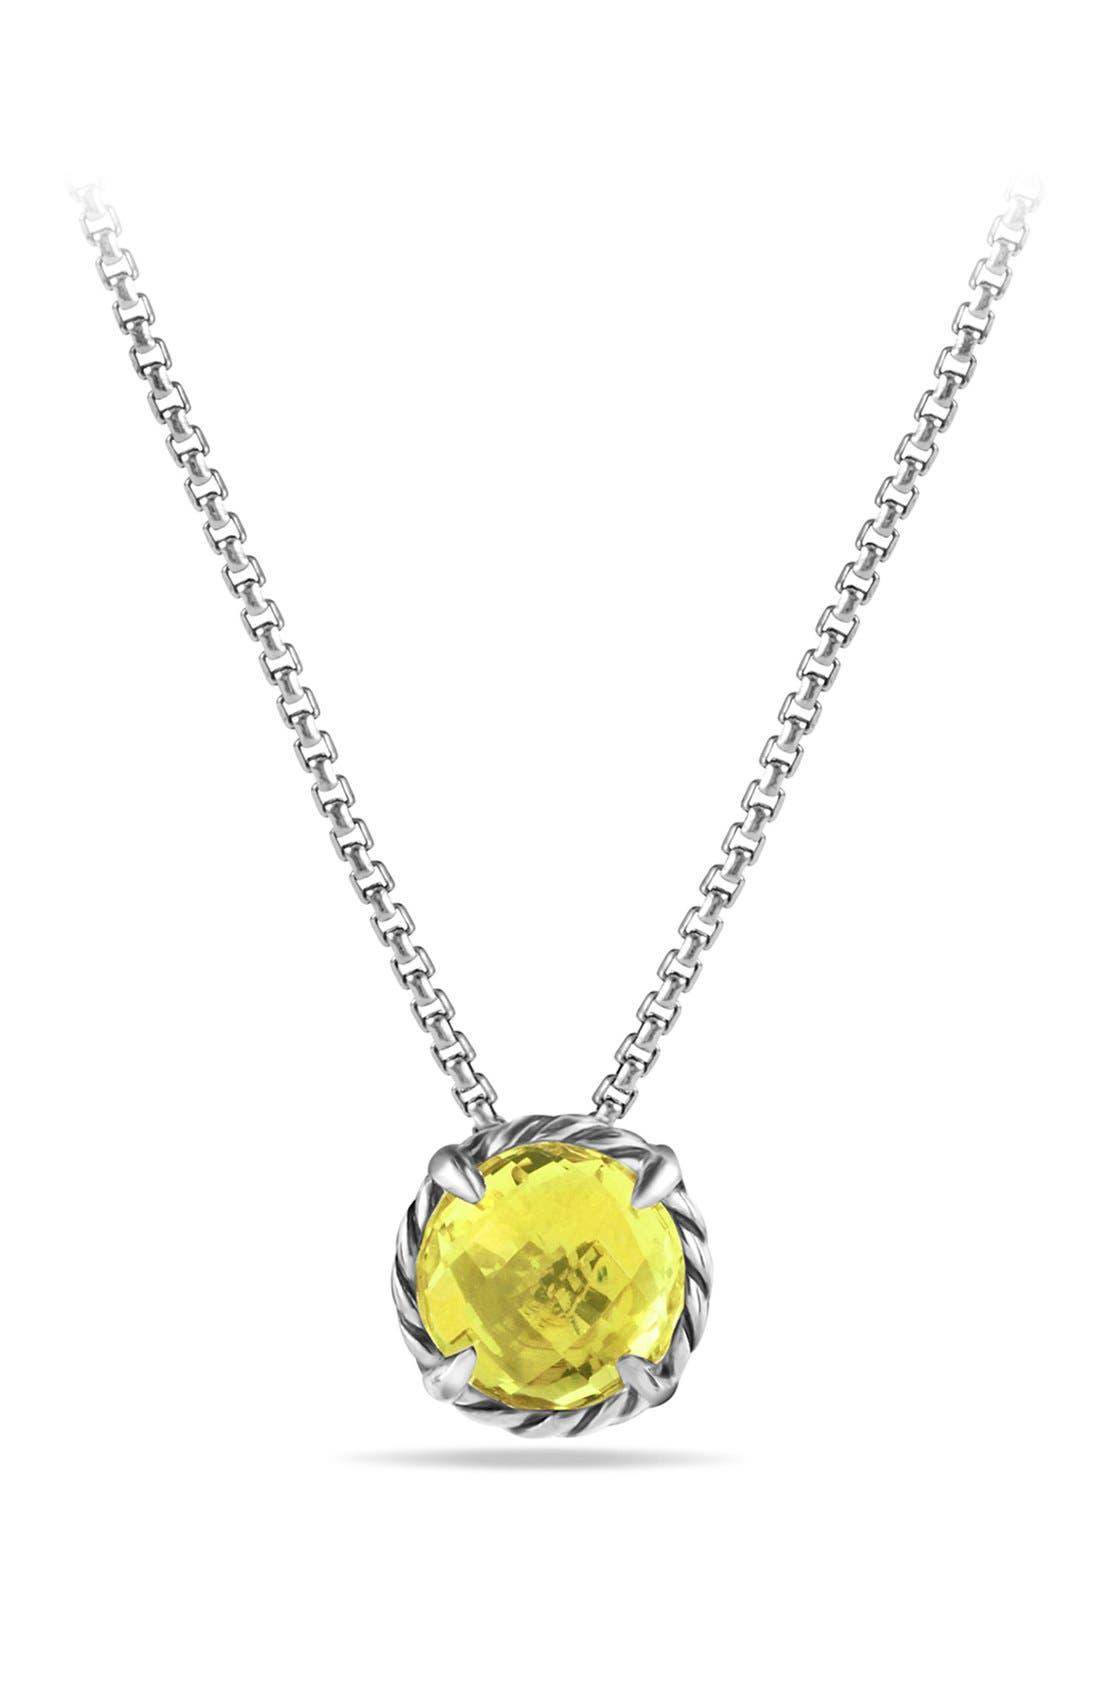 David Yurman'Châtelaine' Pendant Necklace